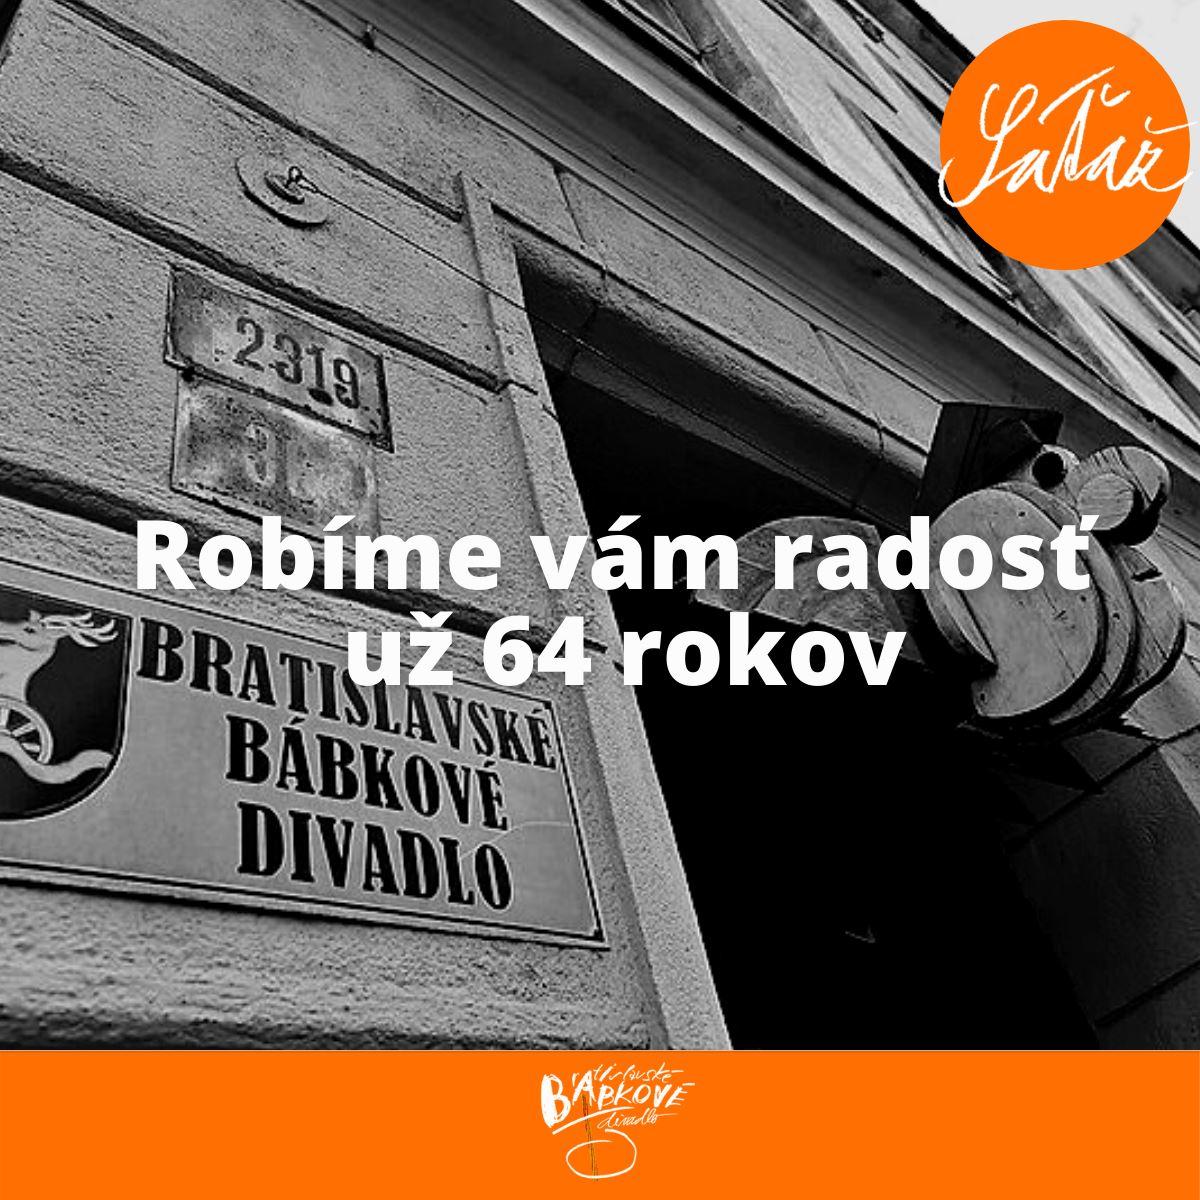 Oslávte narodeniny Bratislavského bábkového divadla súťažou